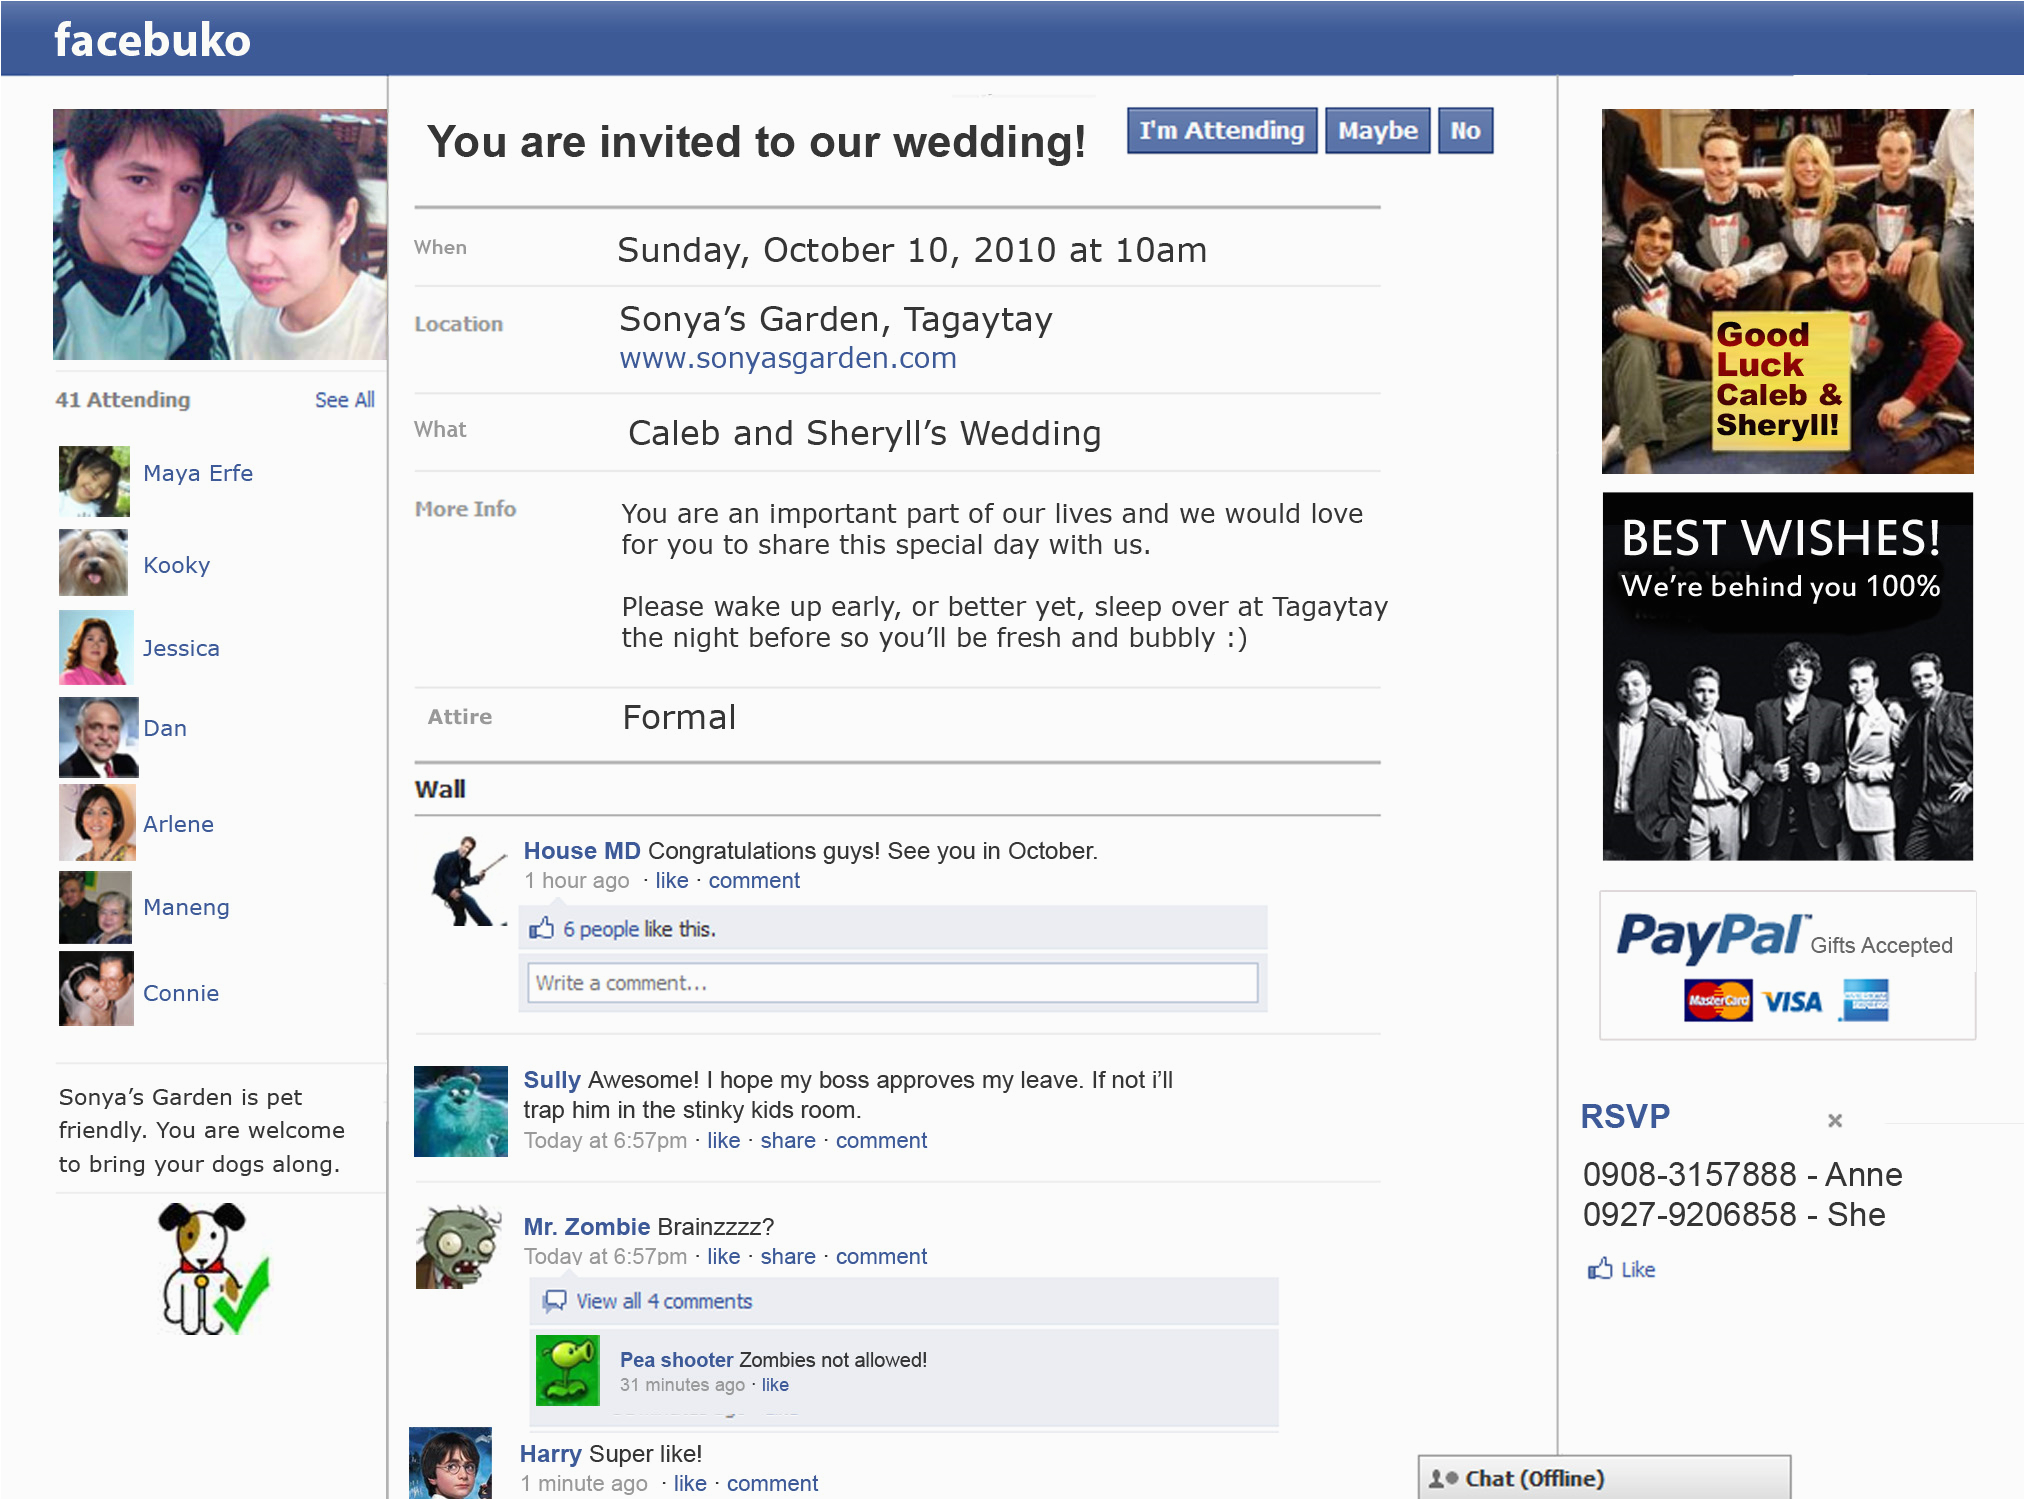 Facebook Birthday Invites Innovative Invitation For Wedding On 10